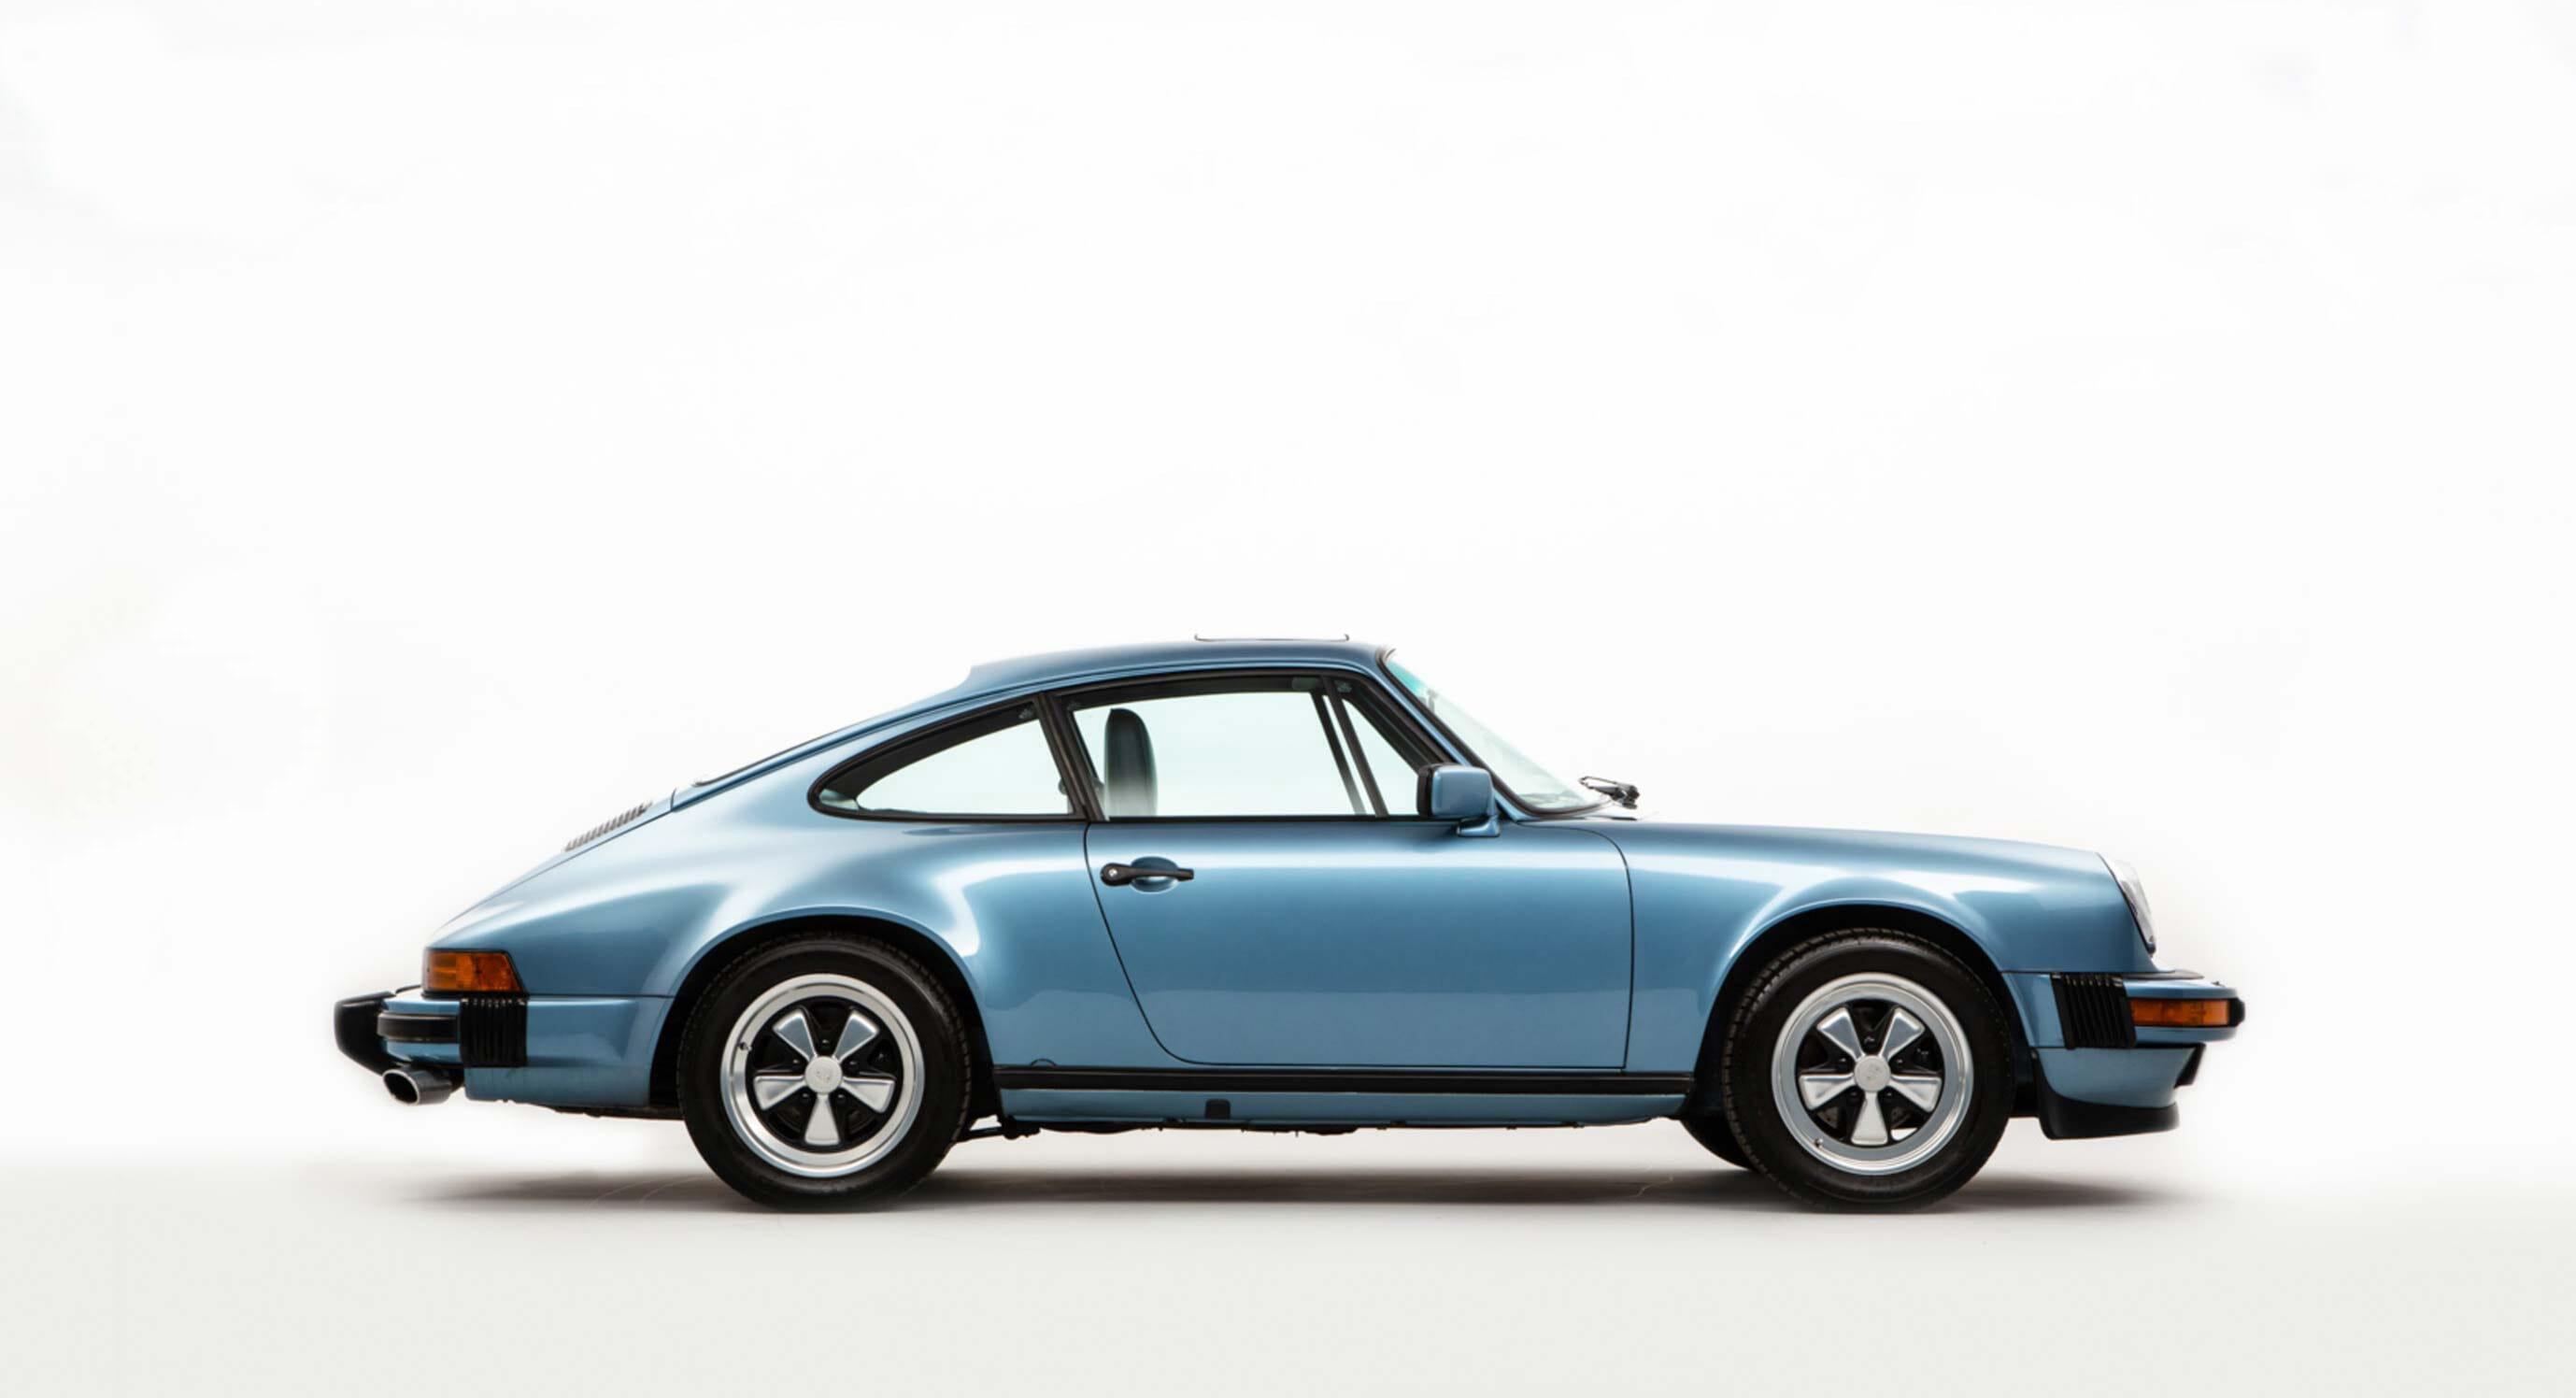 Porsche 911 Carrera 3.2: Into the blue